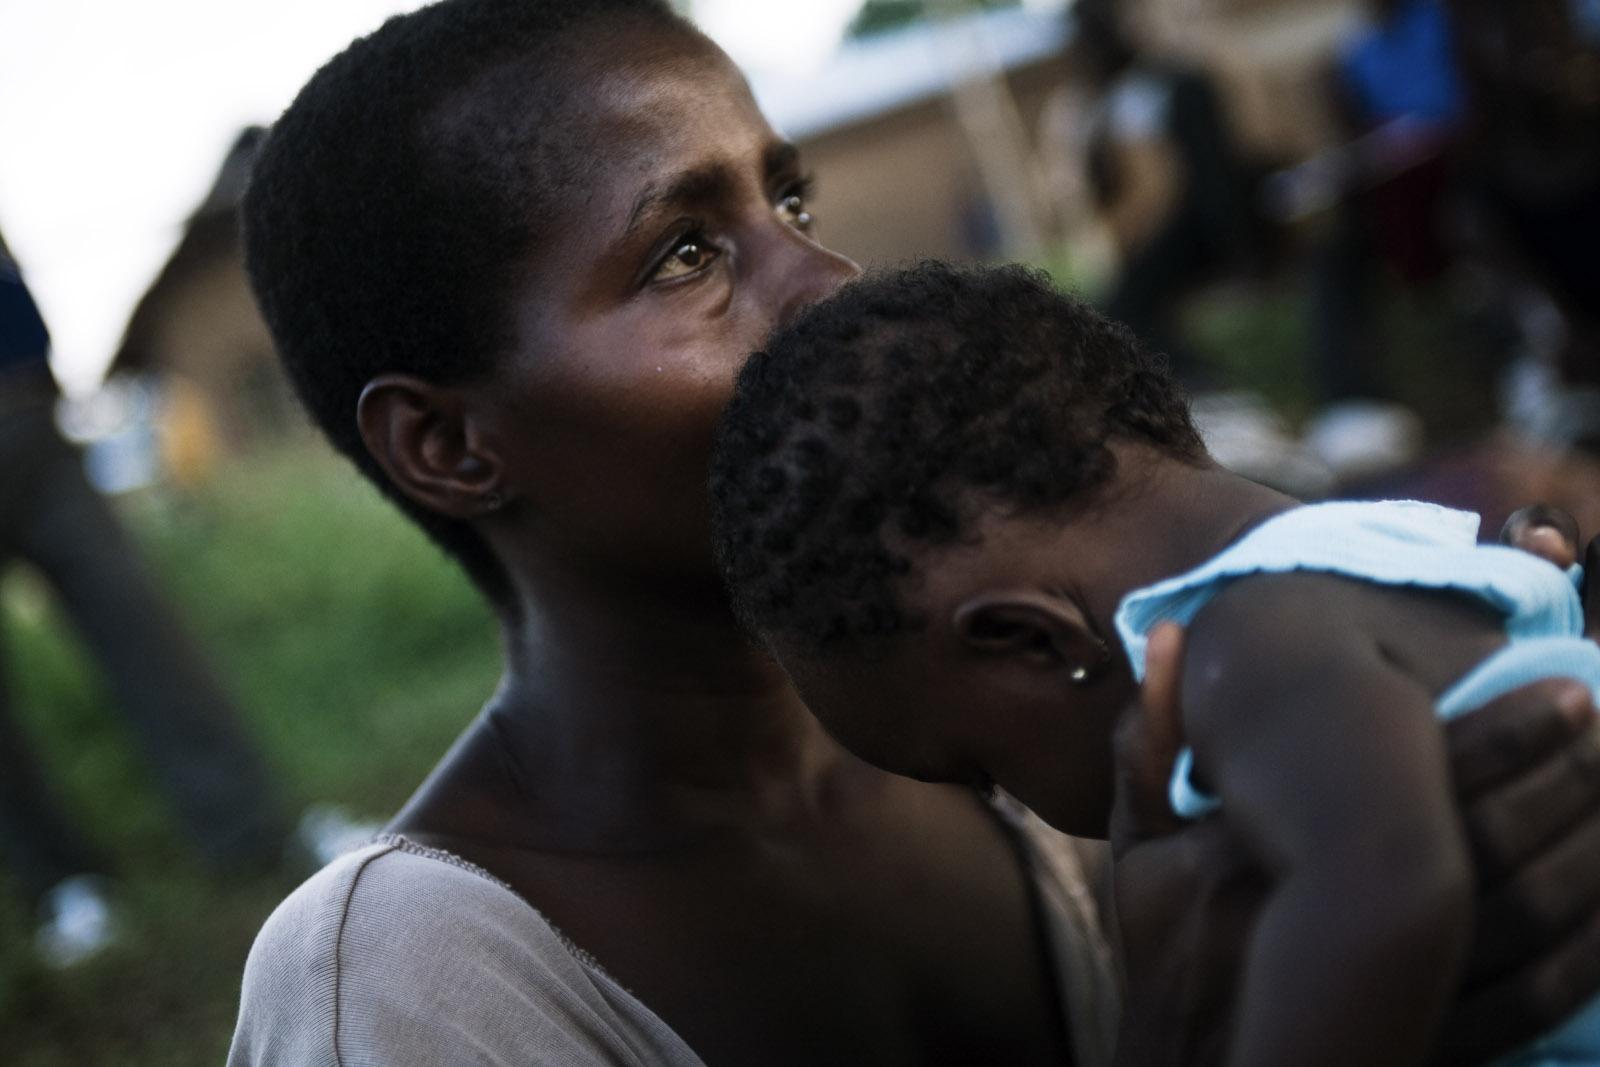 liberia-refugies-ivoiriens-0311-0183hd